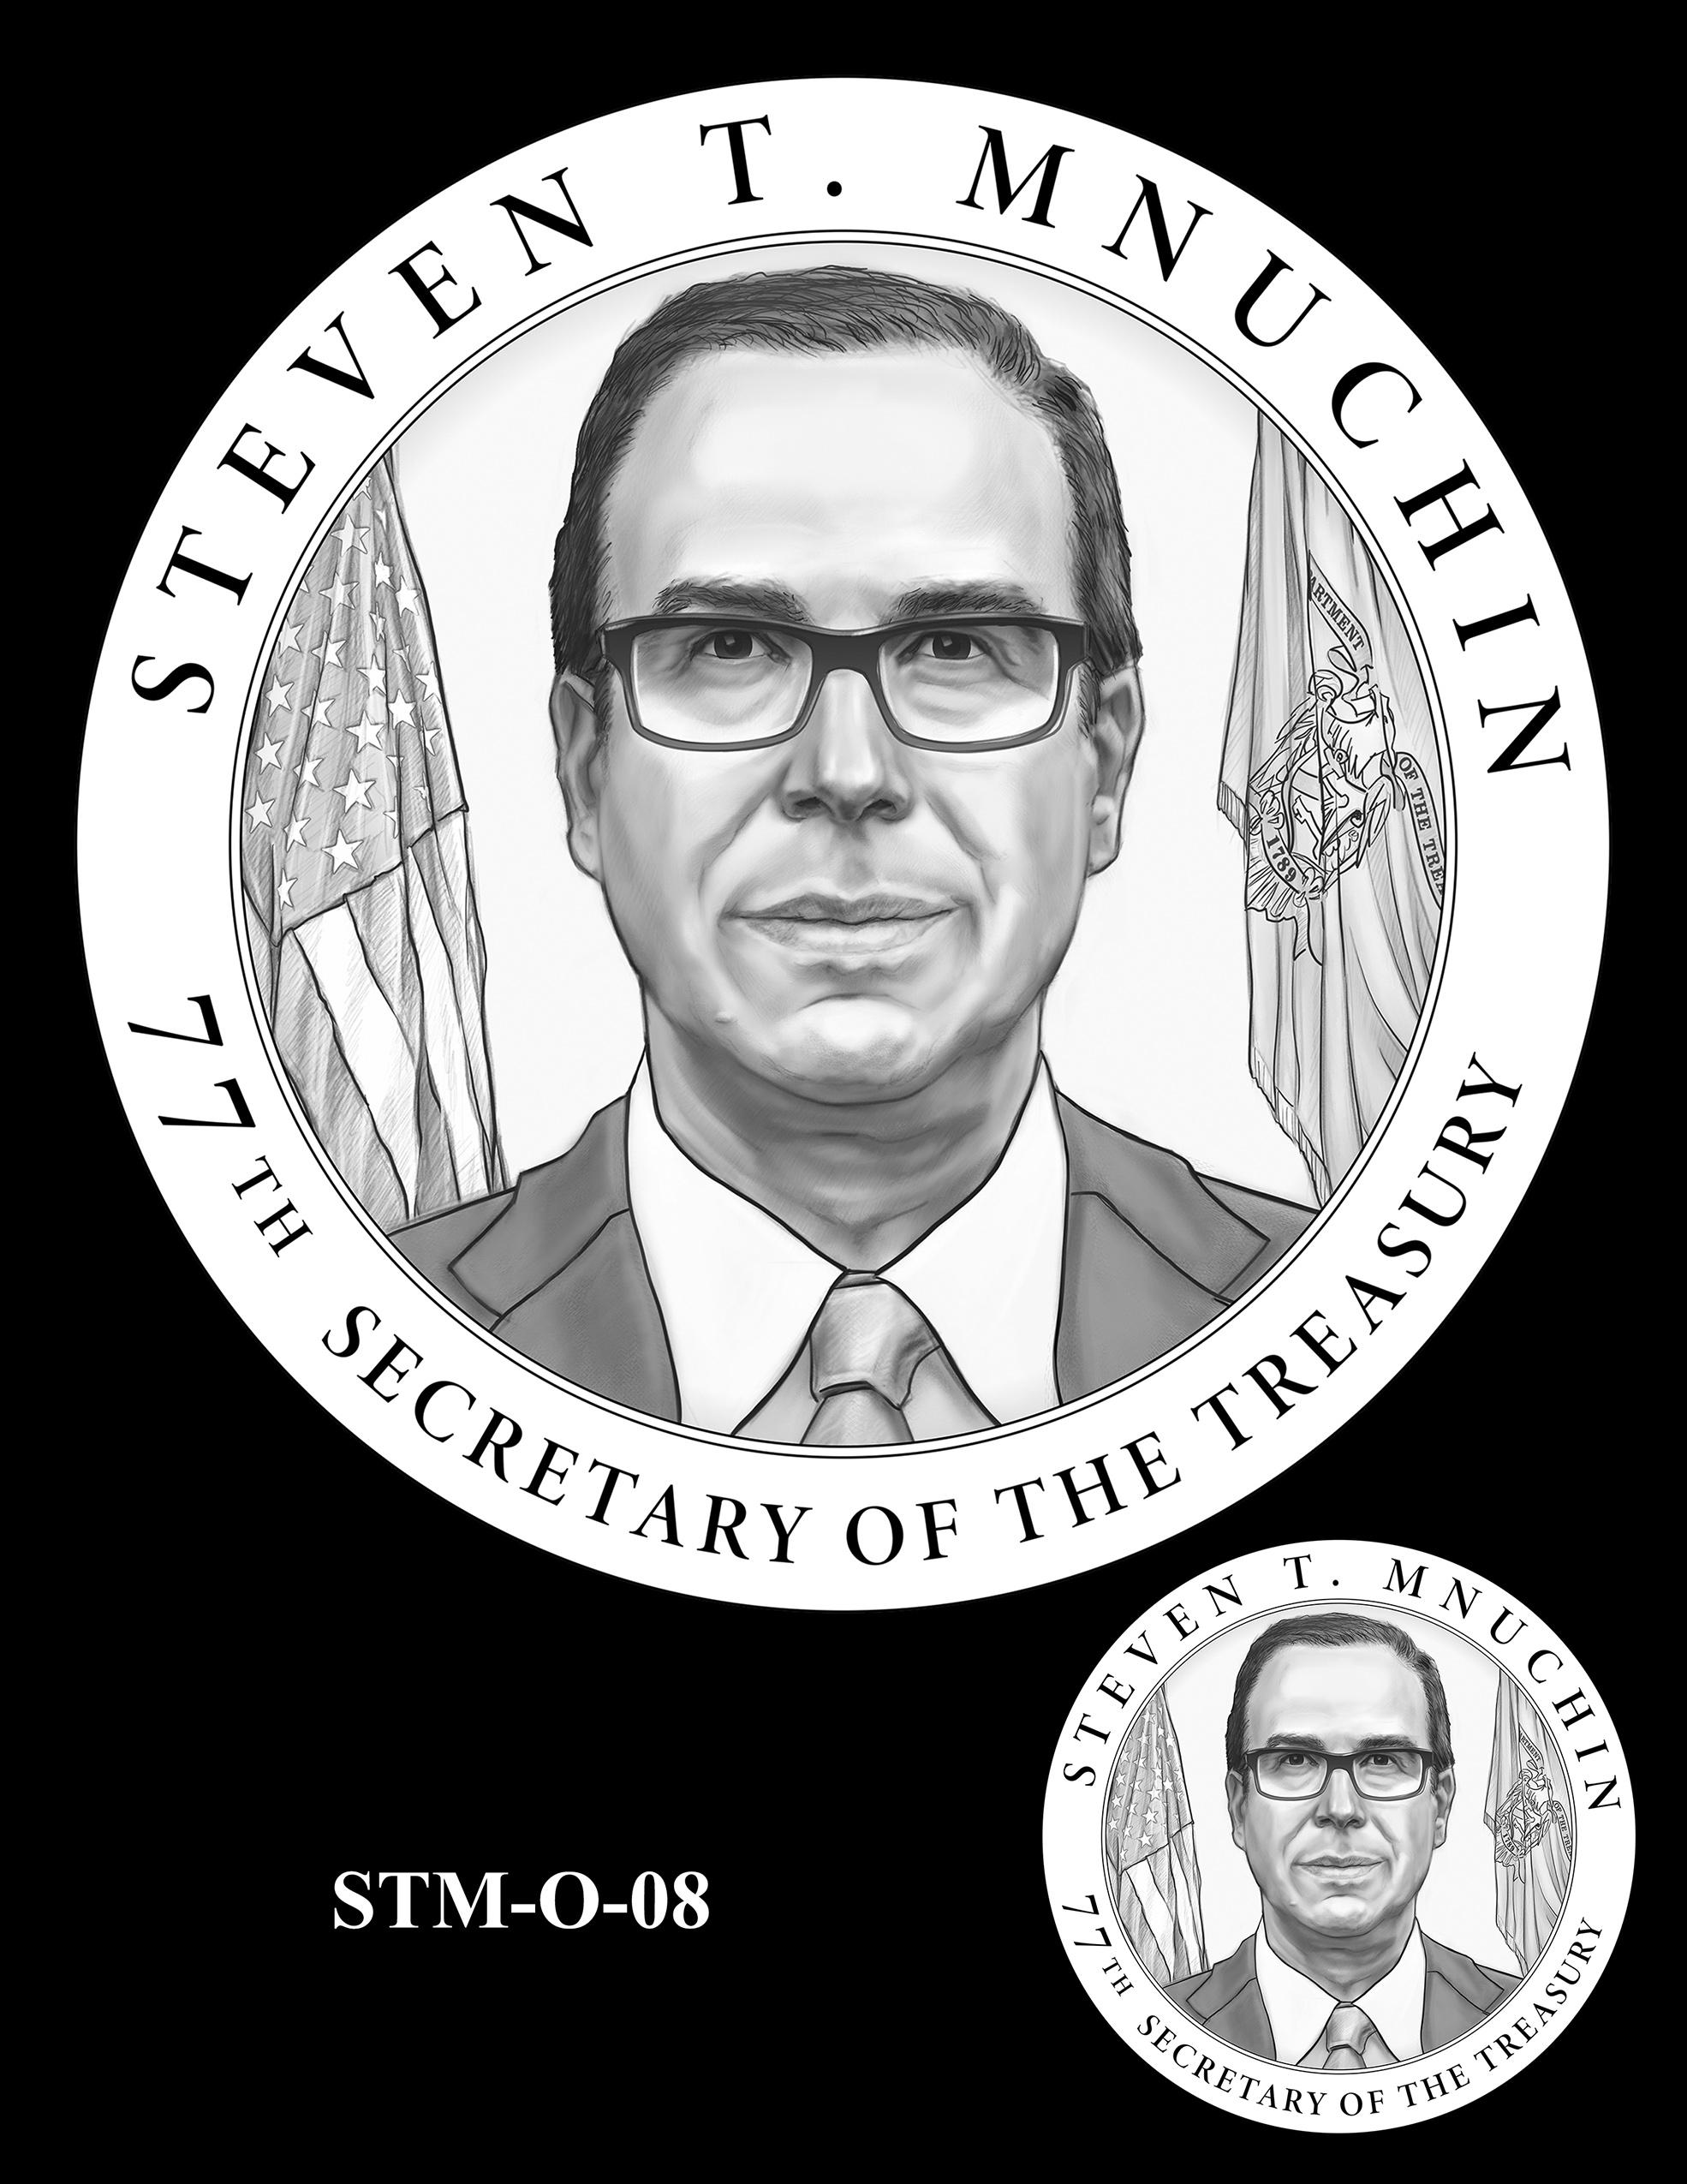 STM-O-08 -- Steven T. Mnuchin Secretary of the Treasury Medal